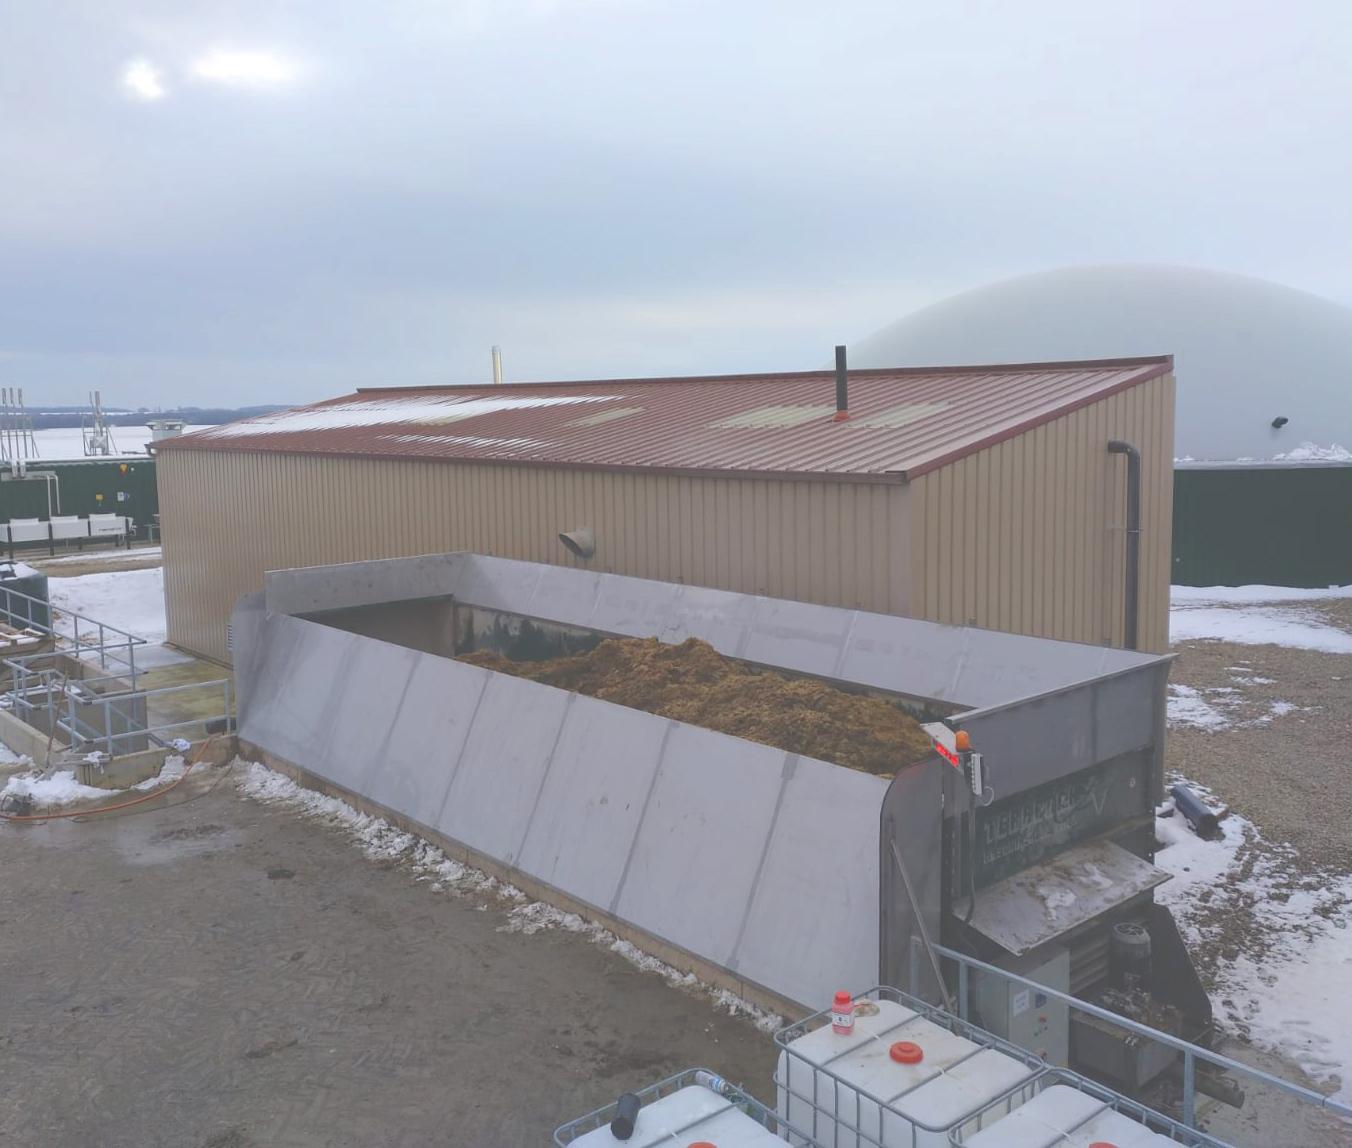 14 Chapas TERBRACK-Fertioise-ENVITEC-Planta-Biogas-Coudun-Francia